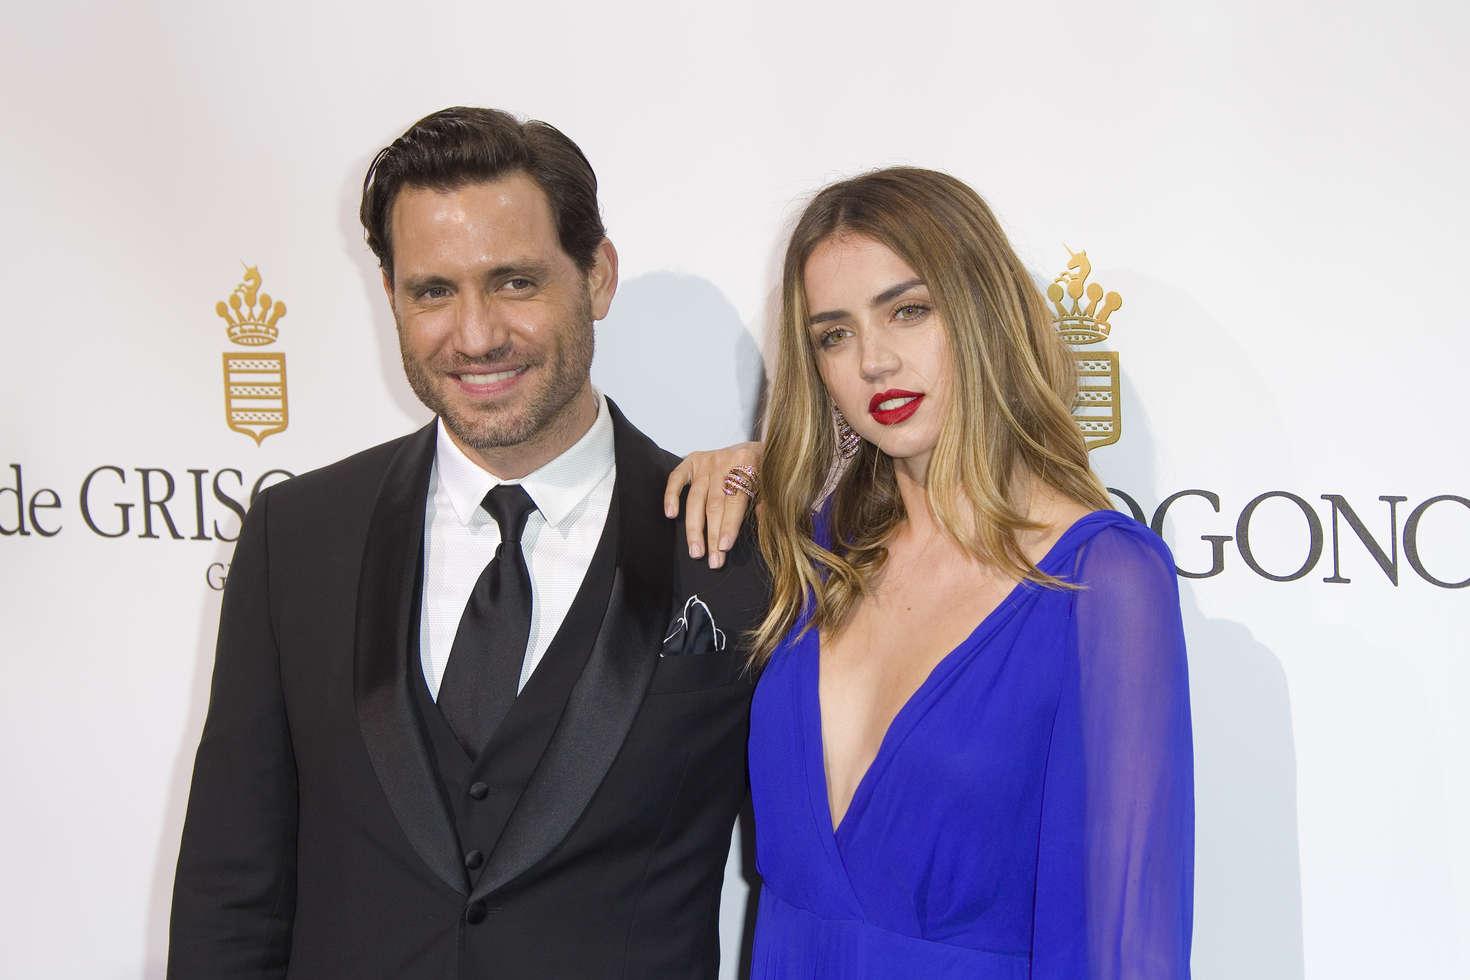 Ana de Armas - De Grisogono Party at 2016 Cannes Film Festival